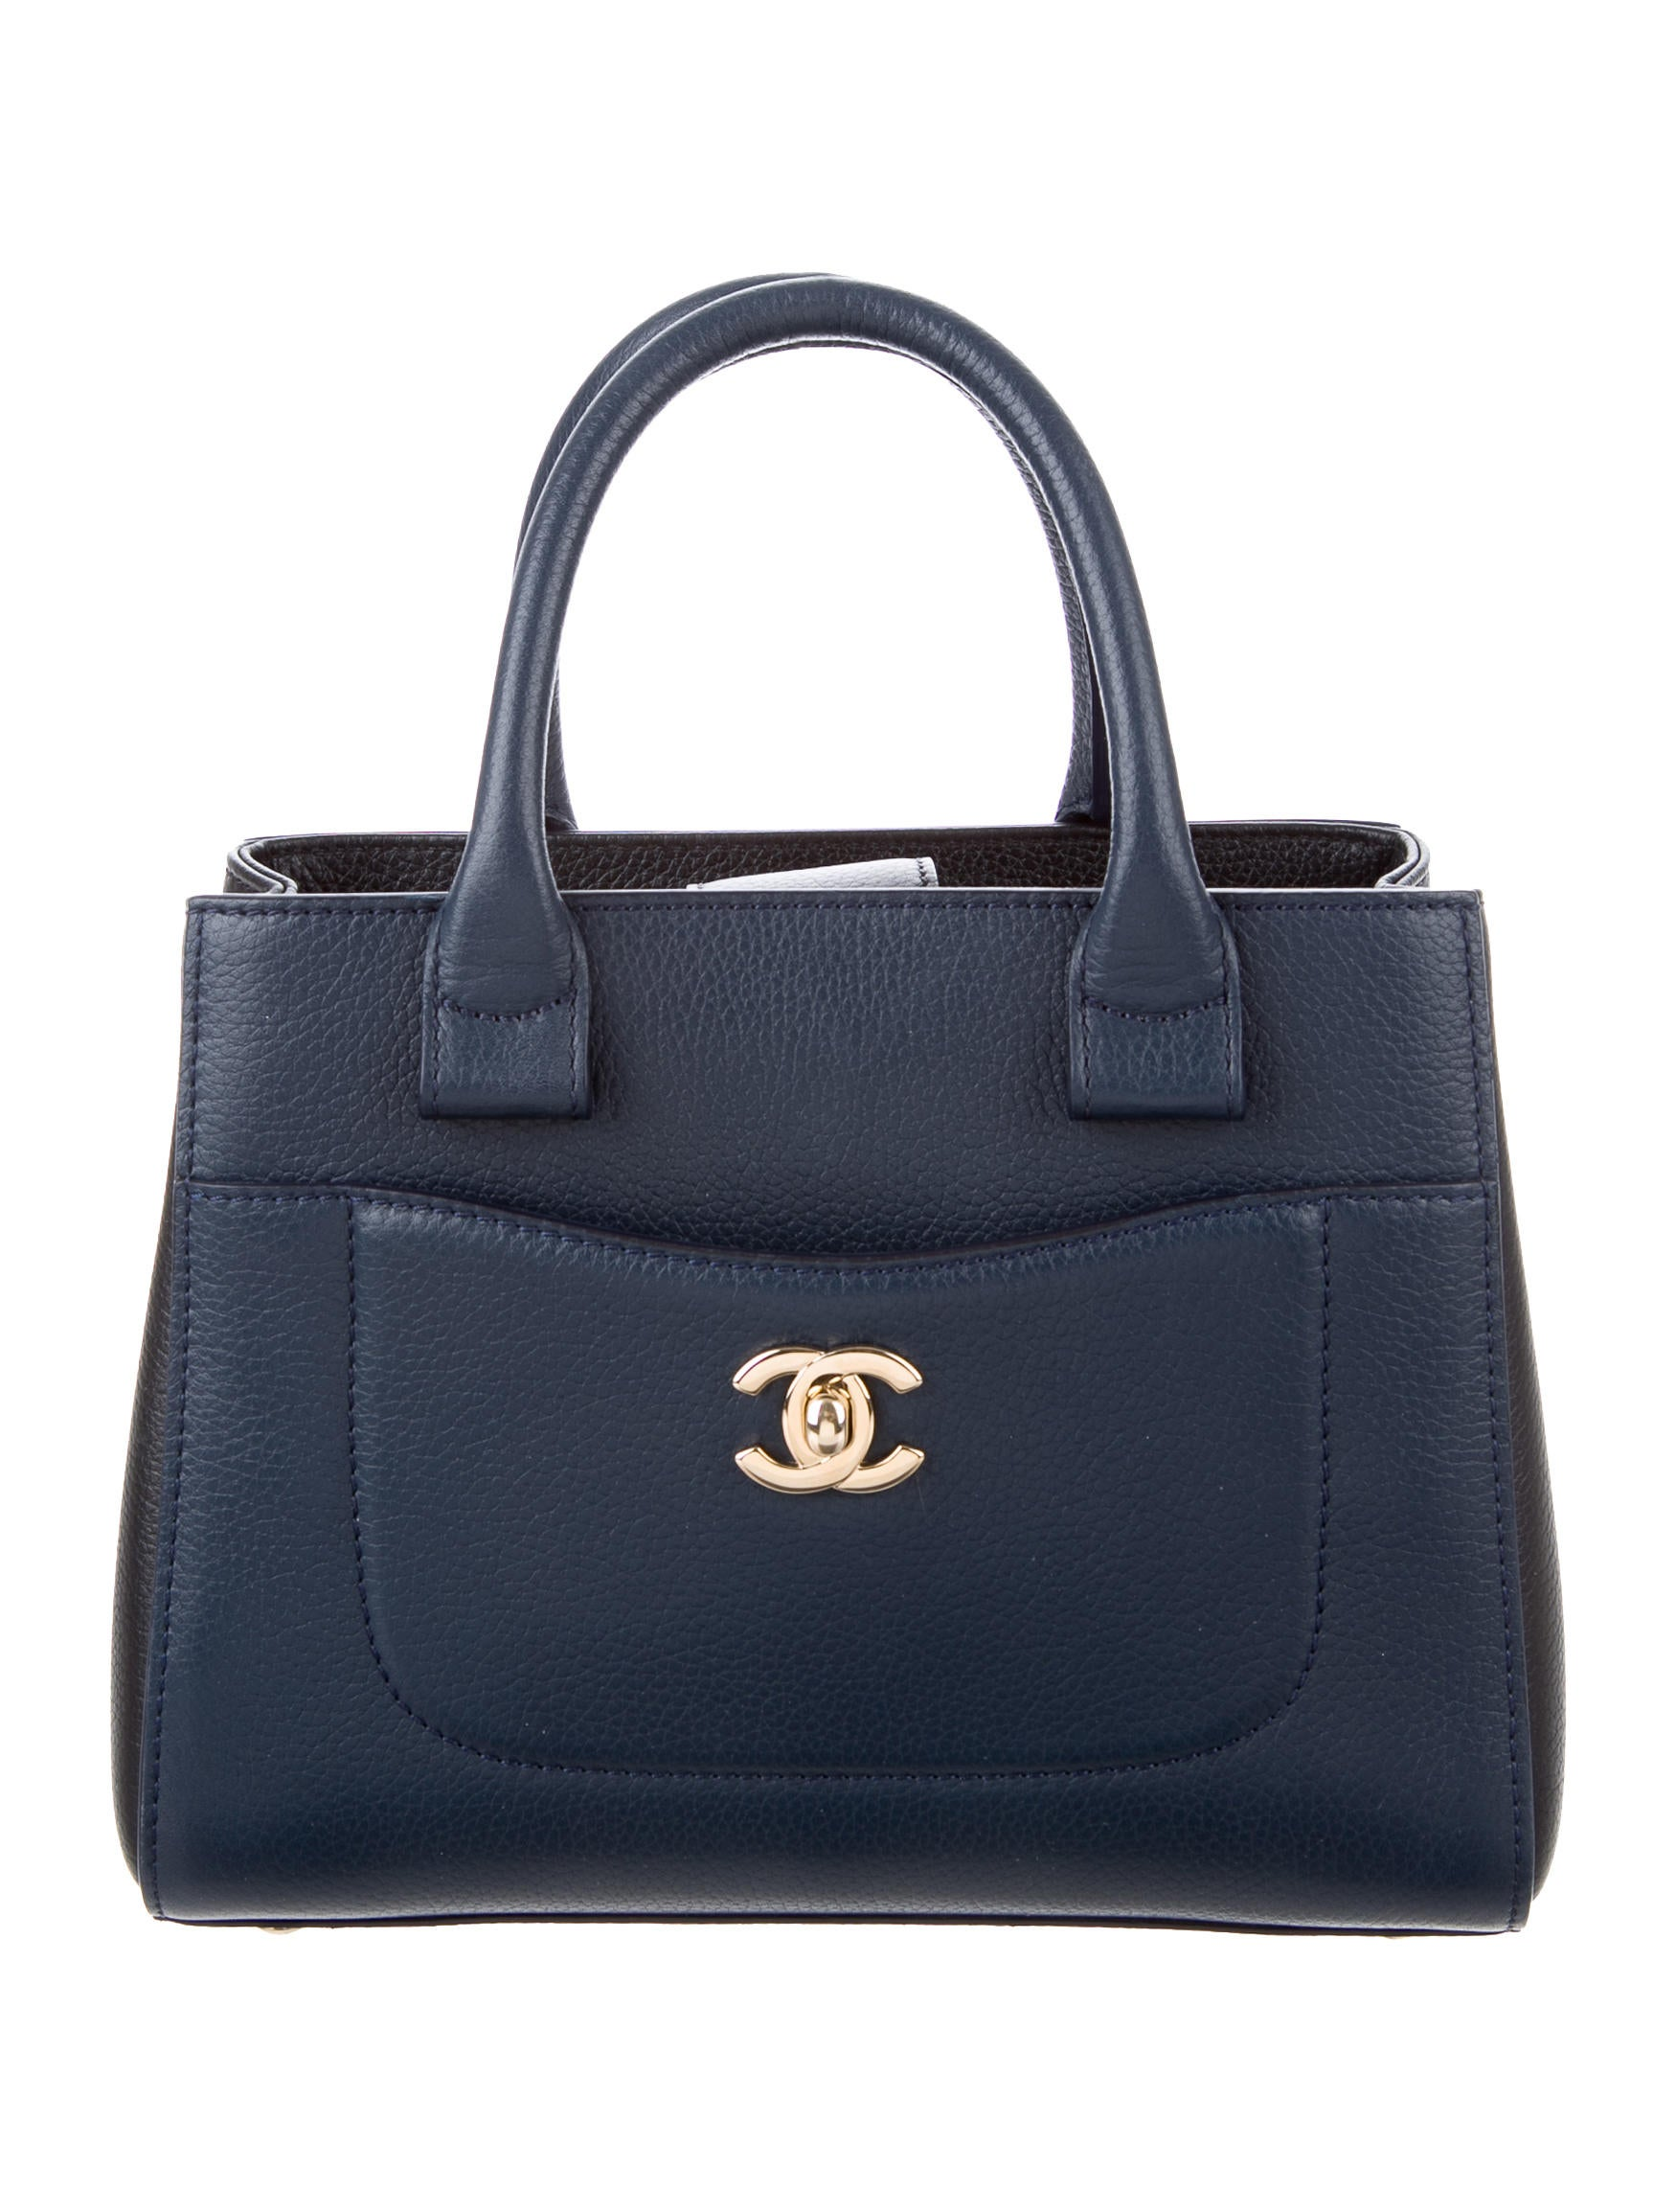 fe8d967dfb4252 Chanel 2017 Mini Neo Executive Shopper Tote - Handbags - CHA163468 | The  RealReal